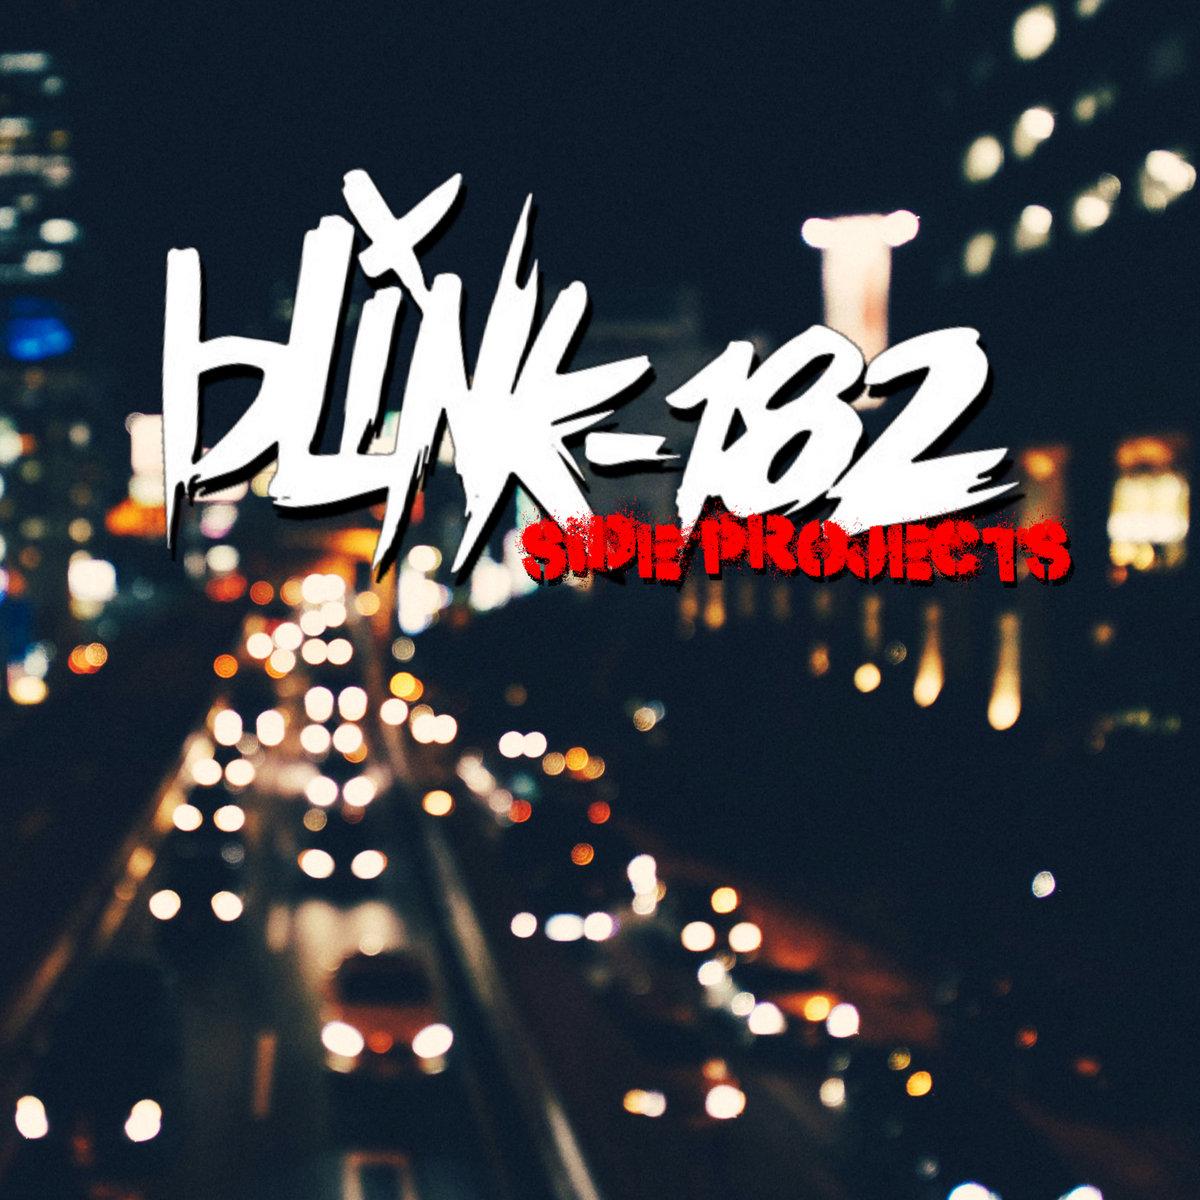 blink 182 discografia download rar